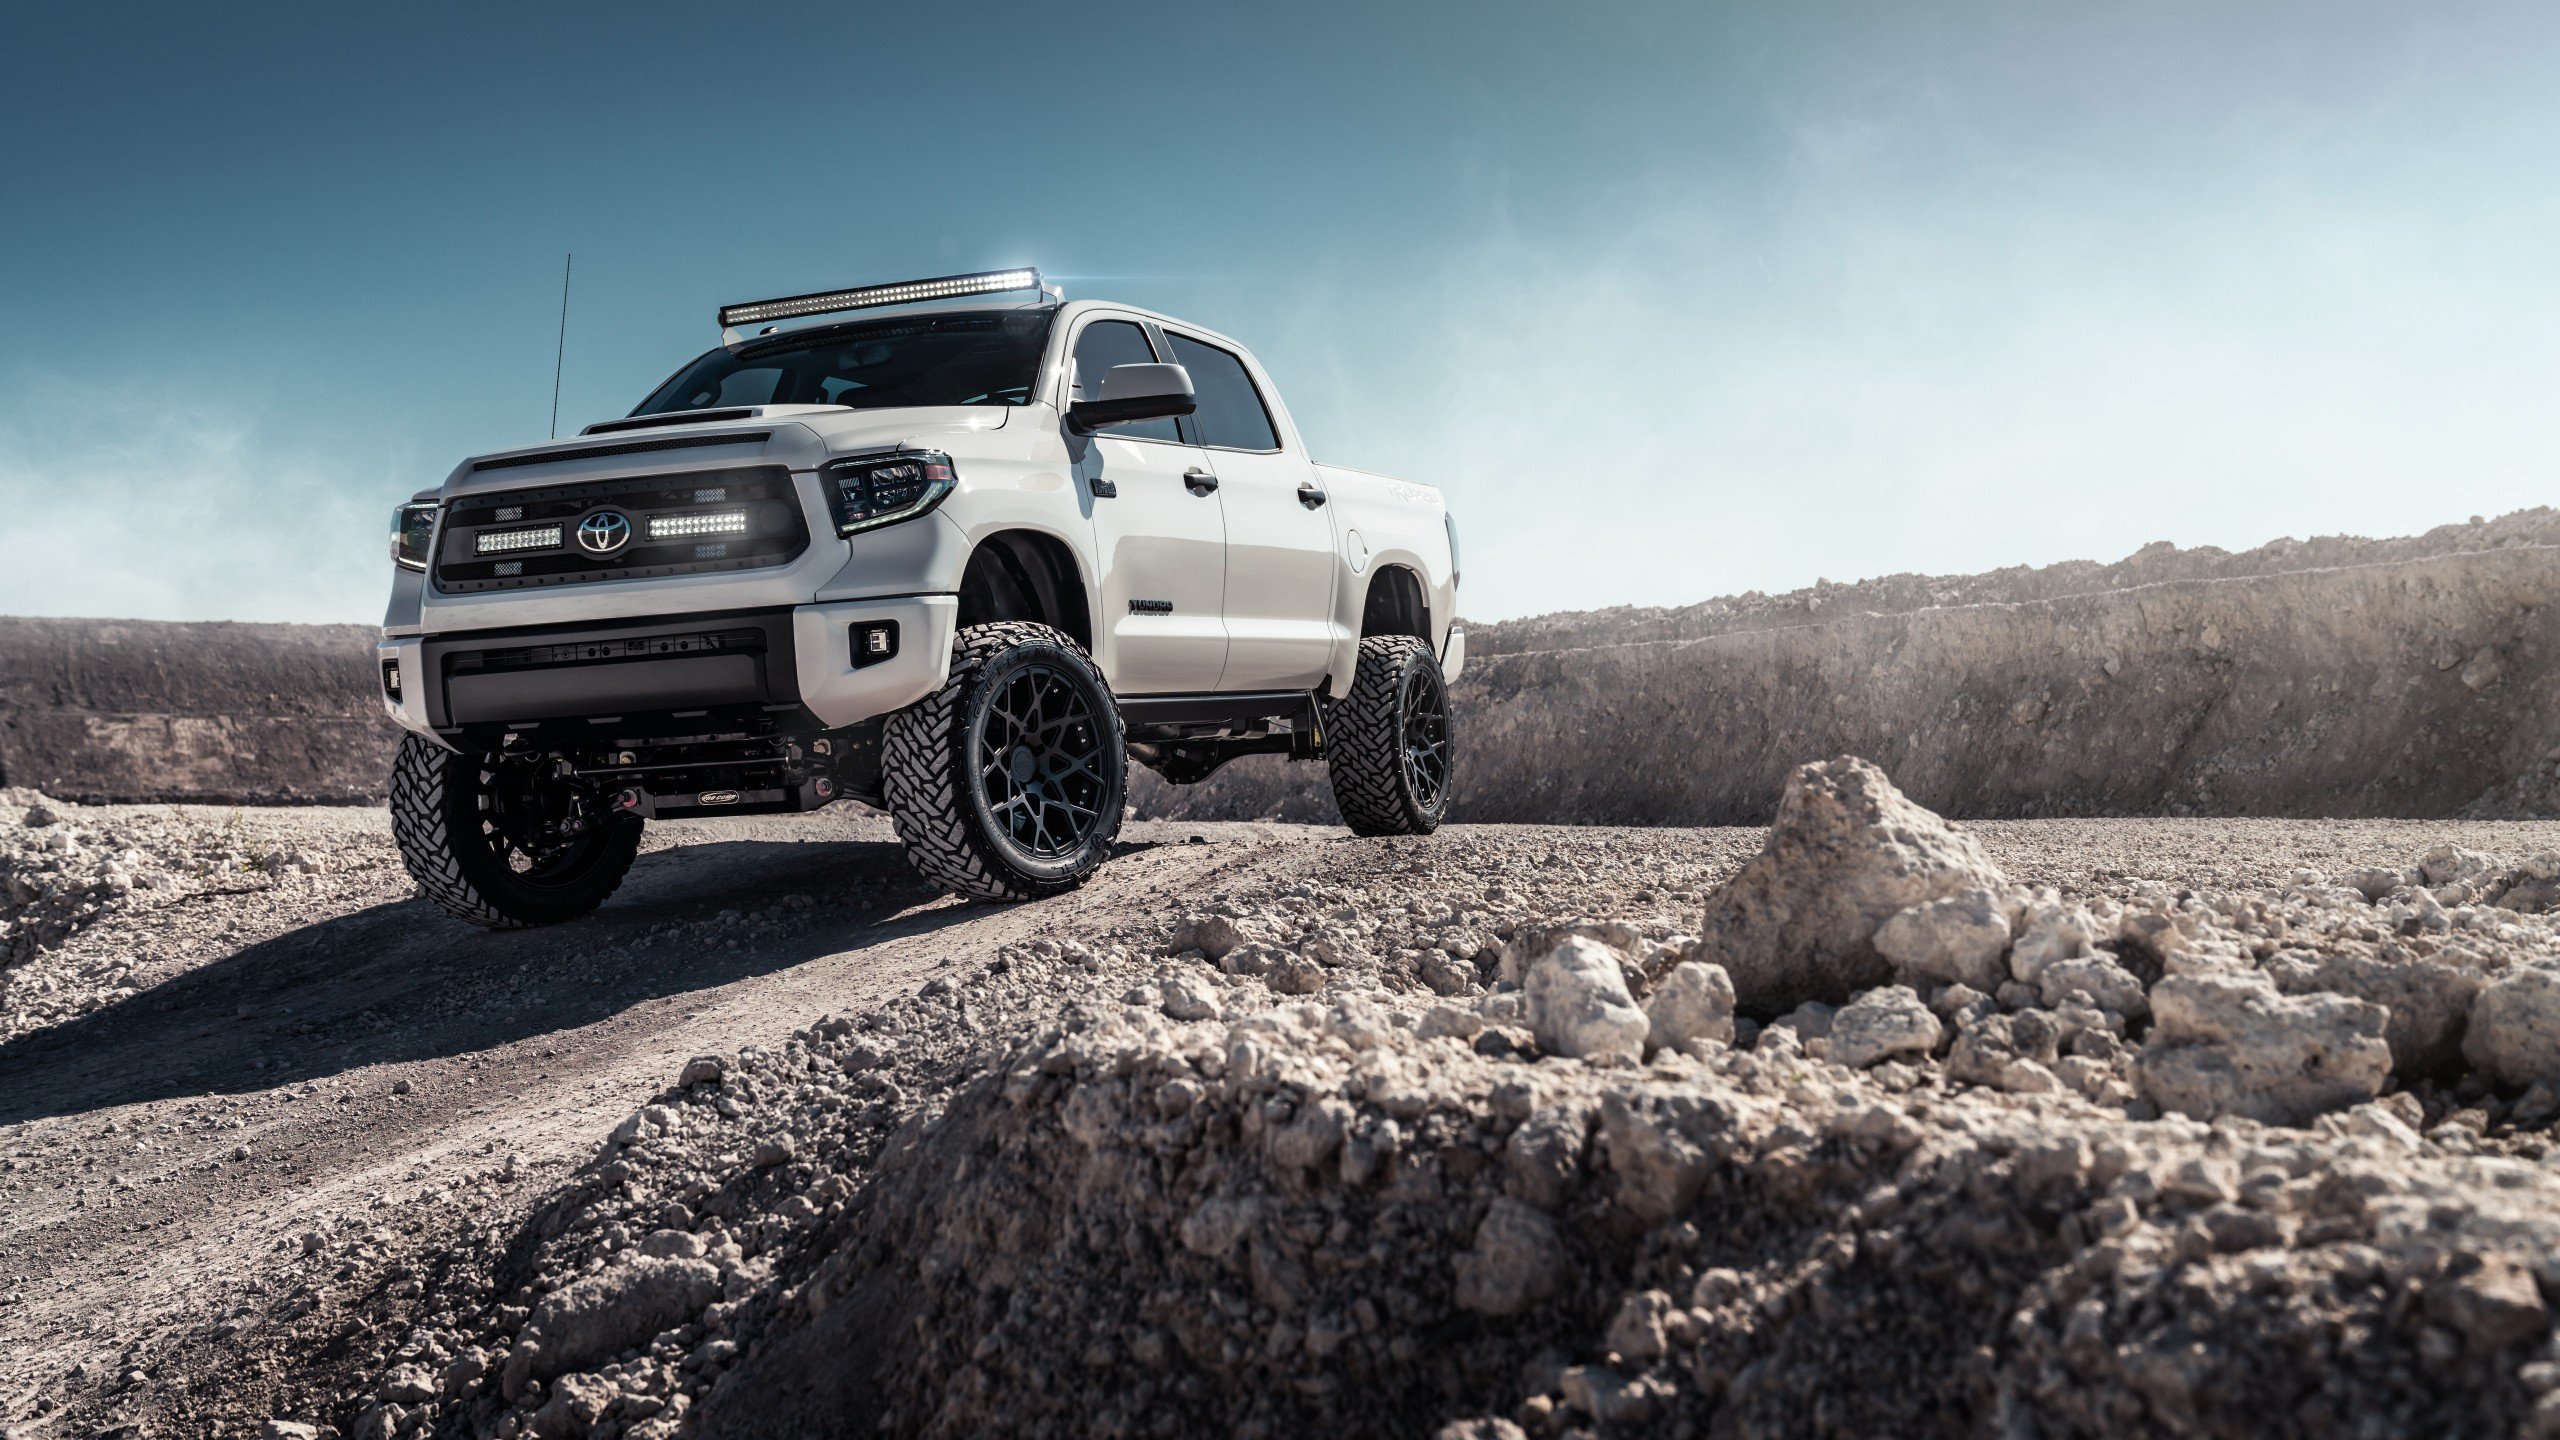 Toyota Tundra 2019 Off-roading 4K 8K Wallpaper | HD Car ...